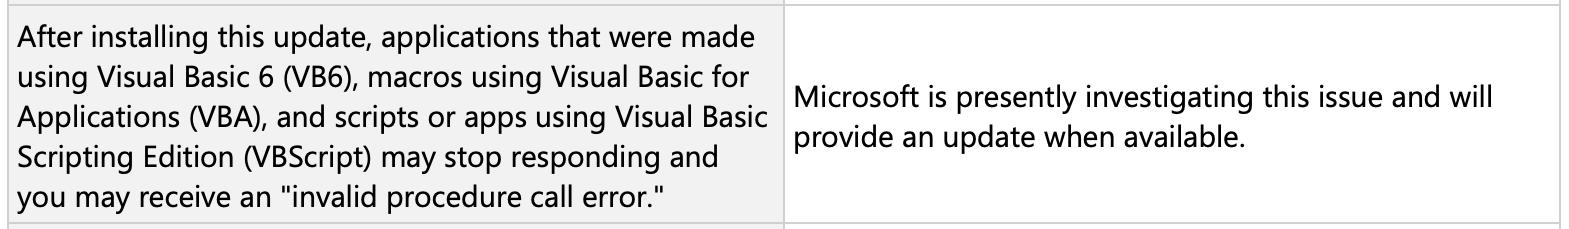 Microsoft confirms Visual Basic issue